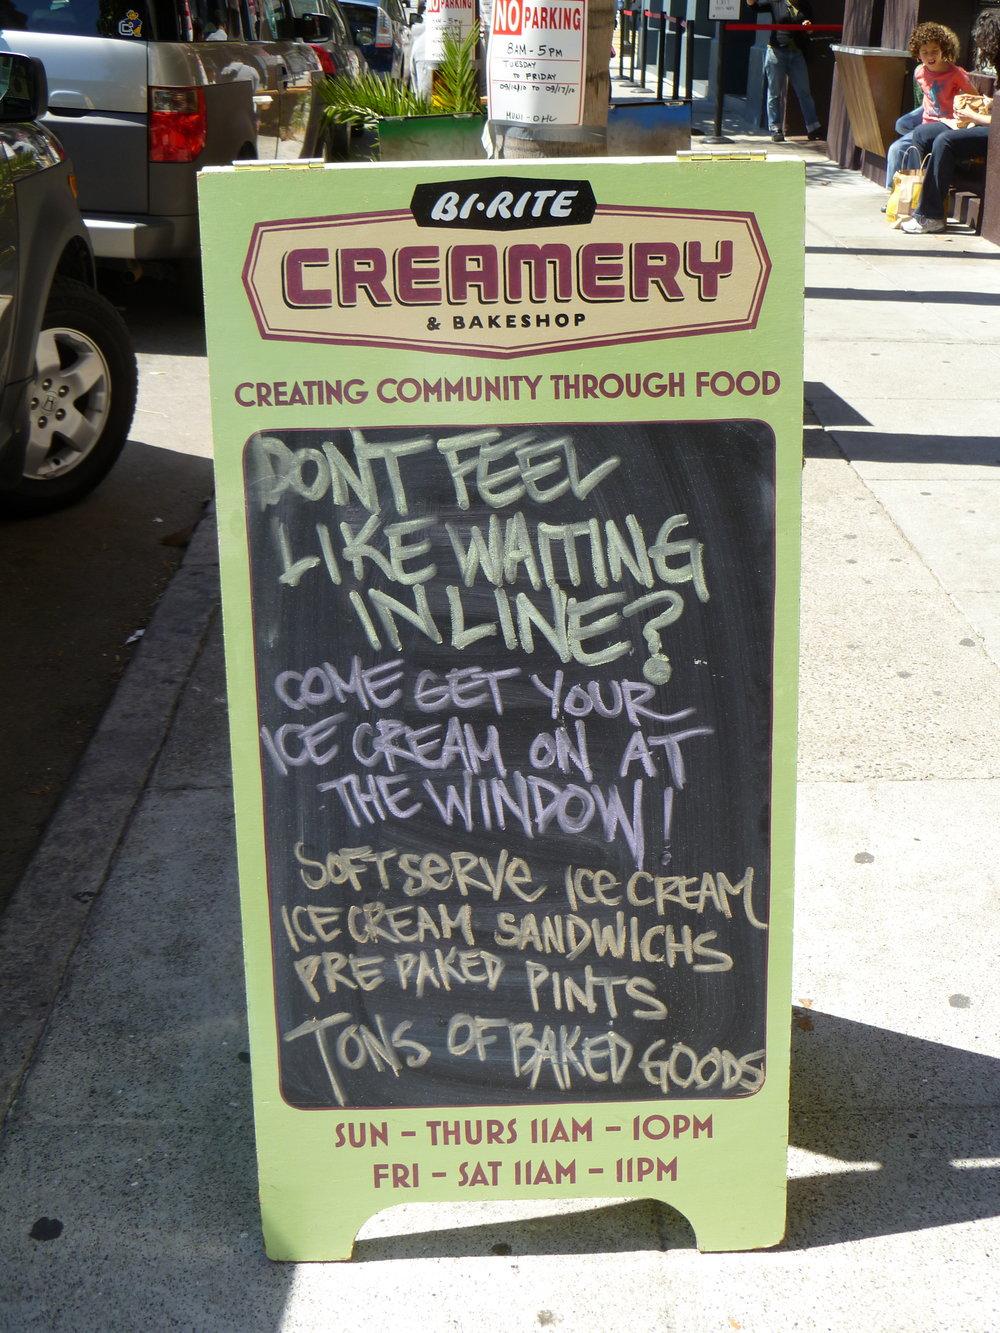 A-FRAME-birite-creamery-sandwich-board_5006799494_o.jpg